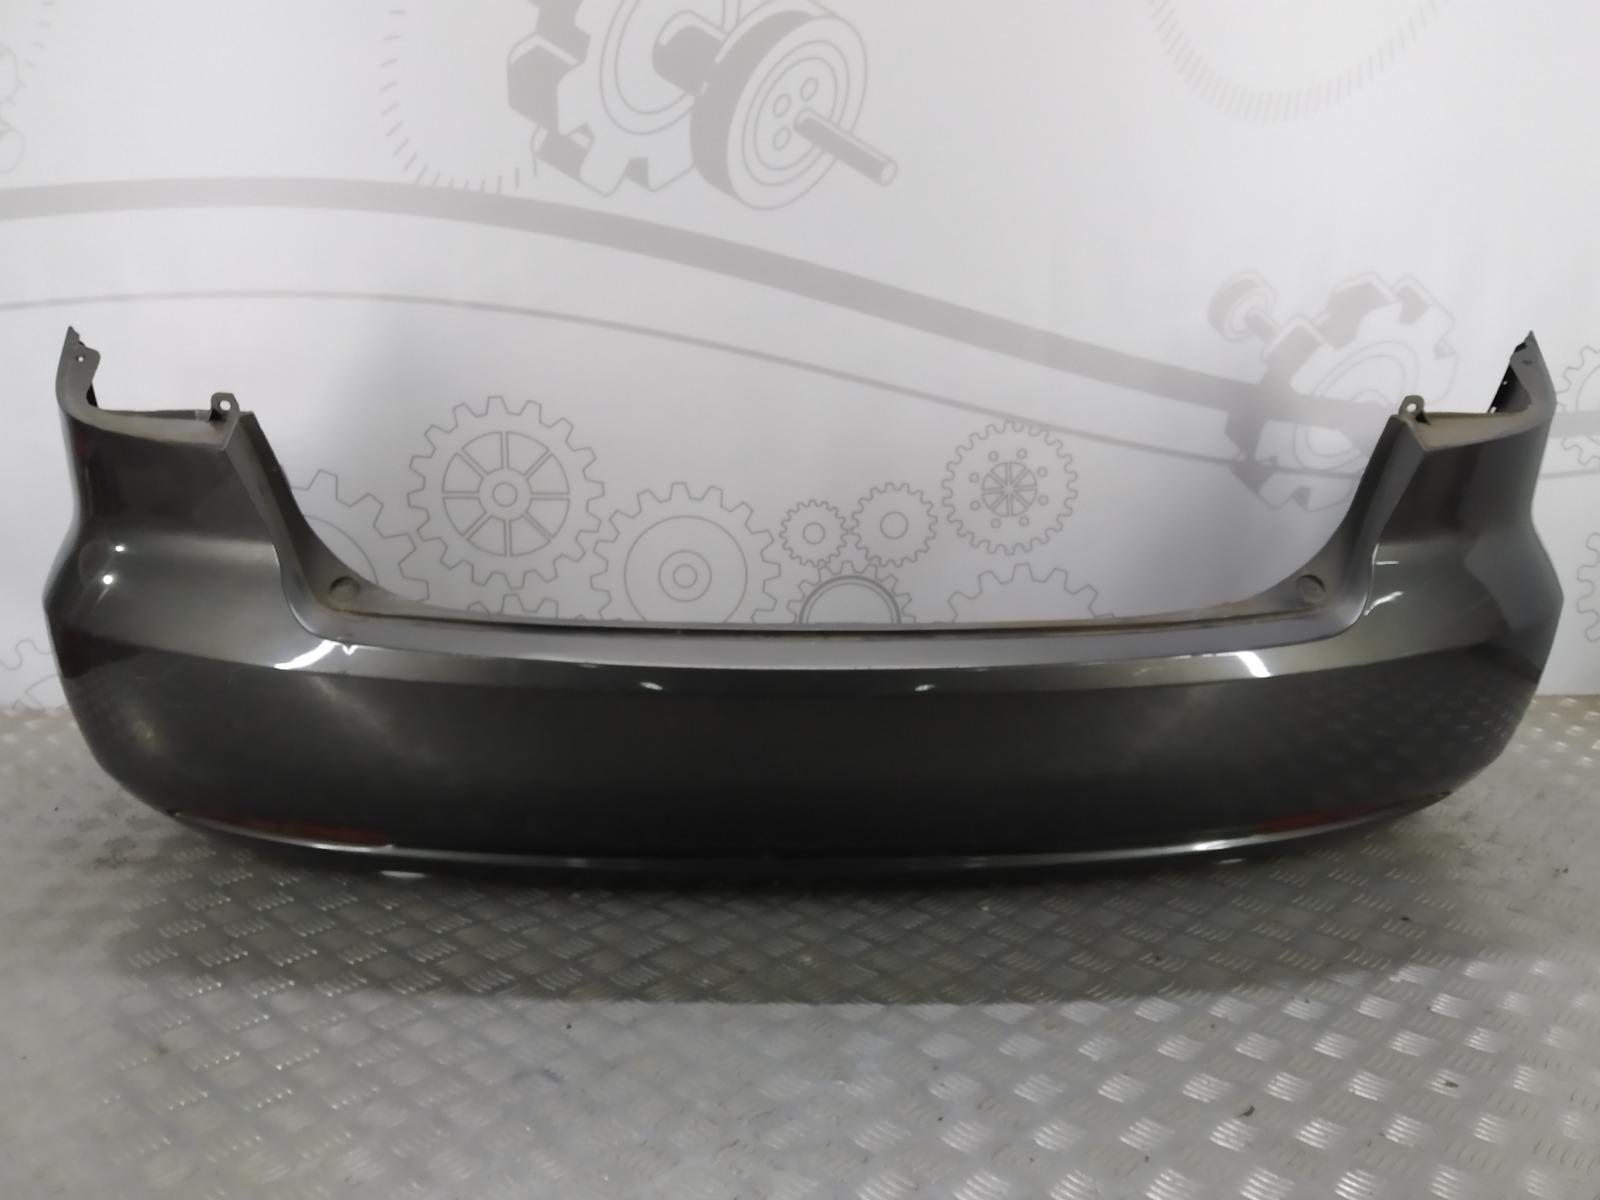 Бампер задний Mazda 6 1.8 I 2007 (б/у)